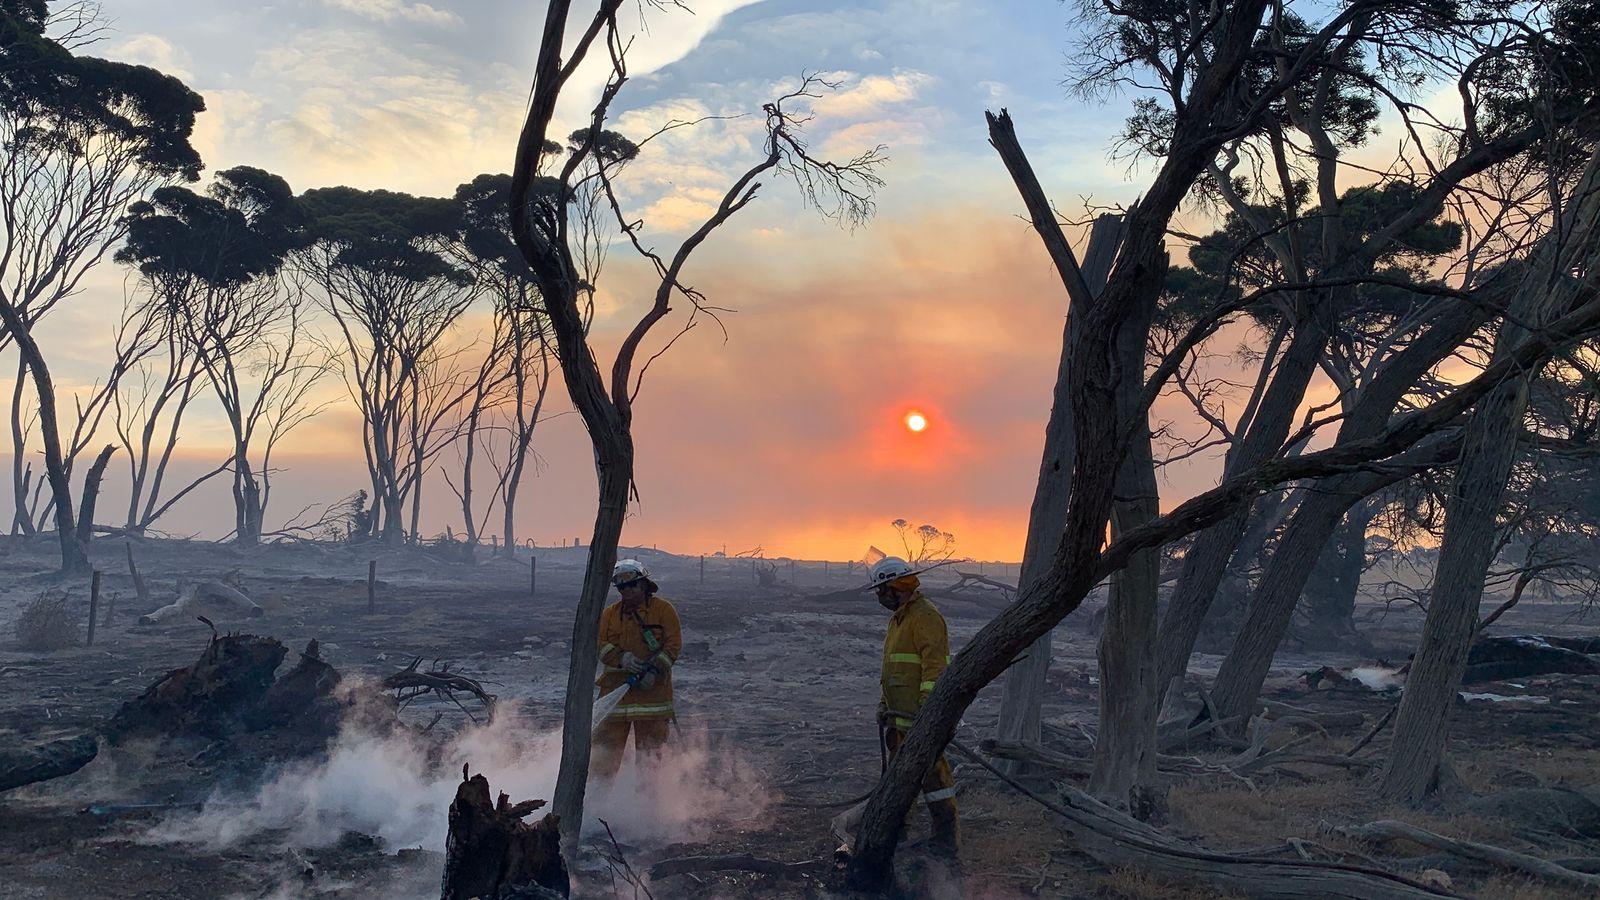 Kangaroo Island volunteer firefighter Jen Child took this photograph of fellow crew members after ...